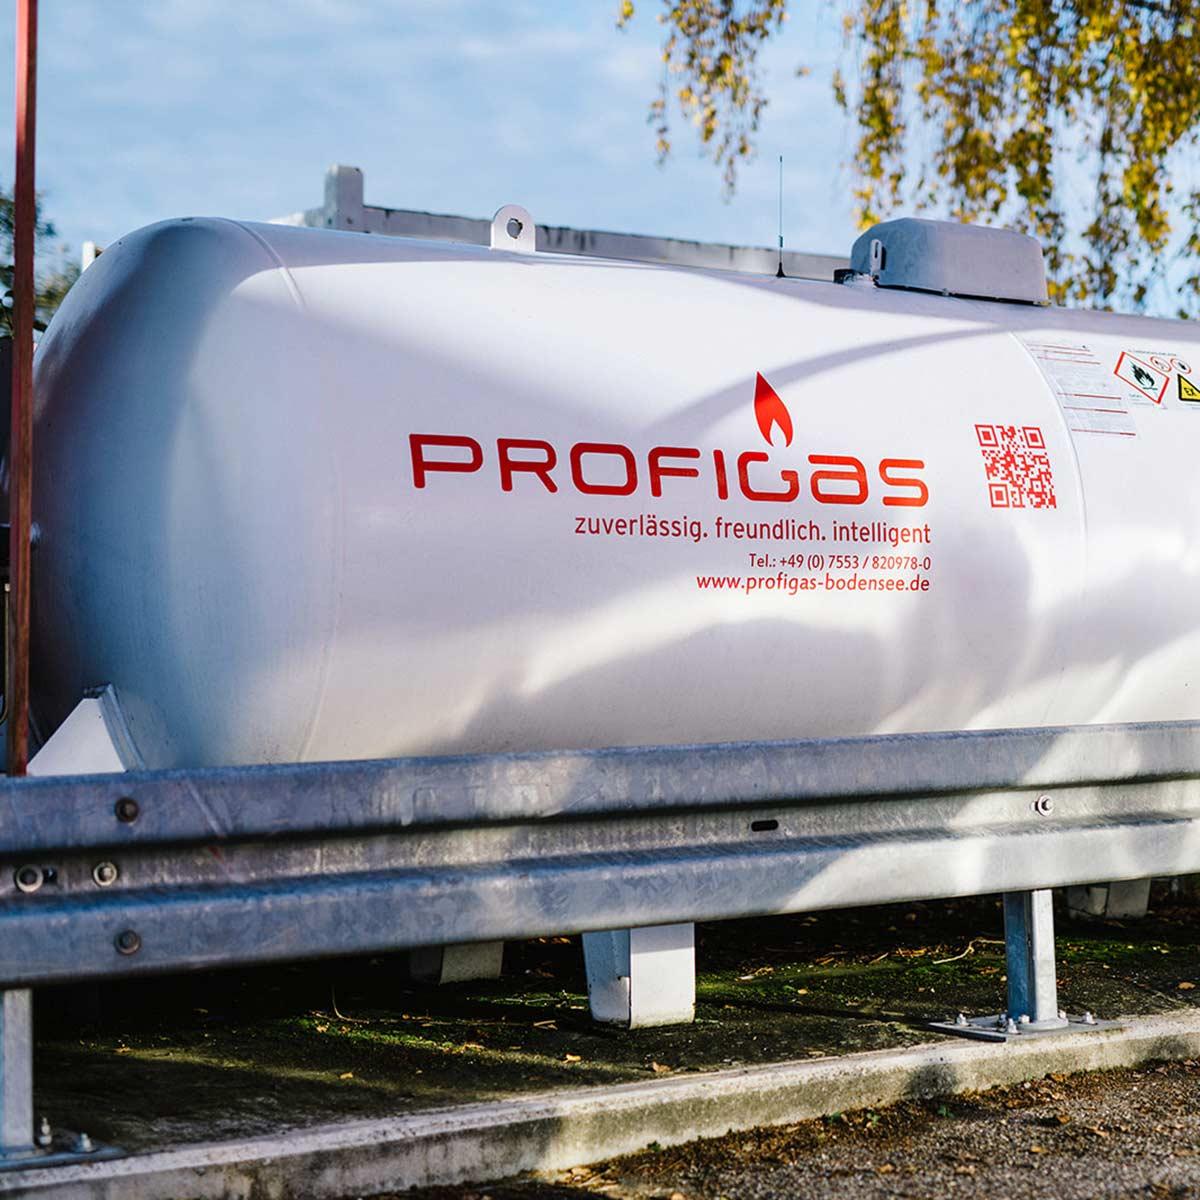 Profigas Tank an einer Autogas Tankstelle